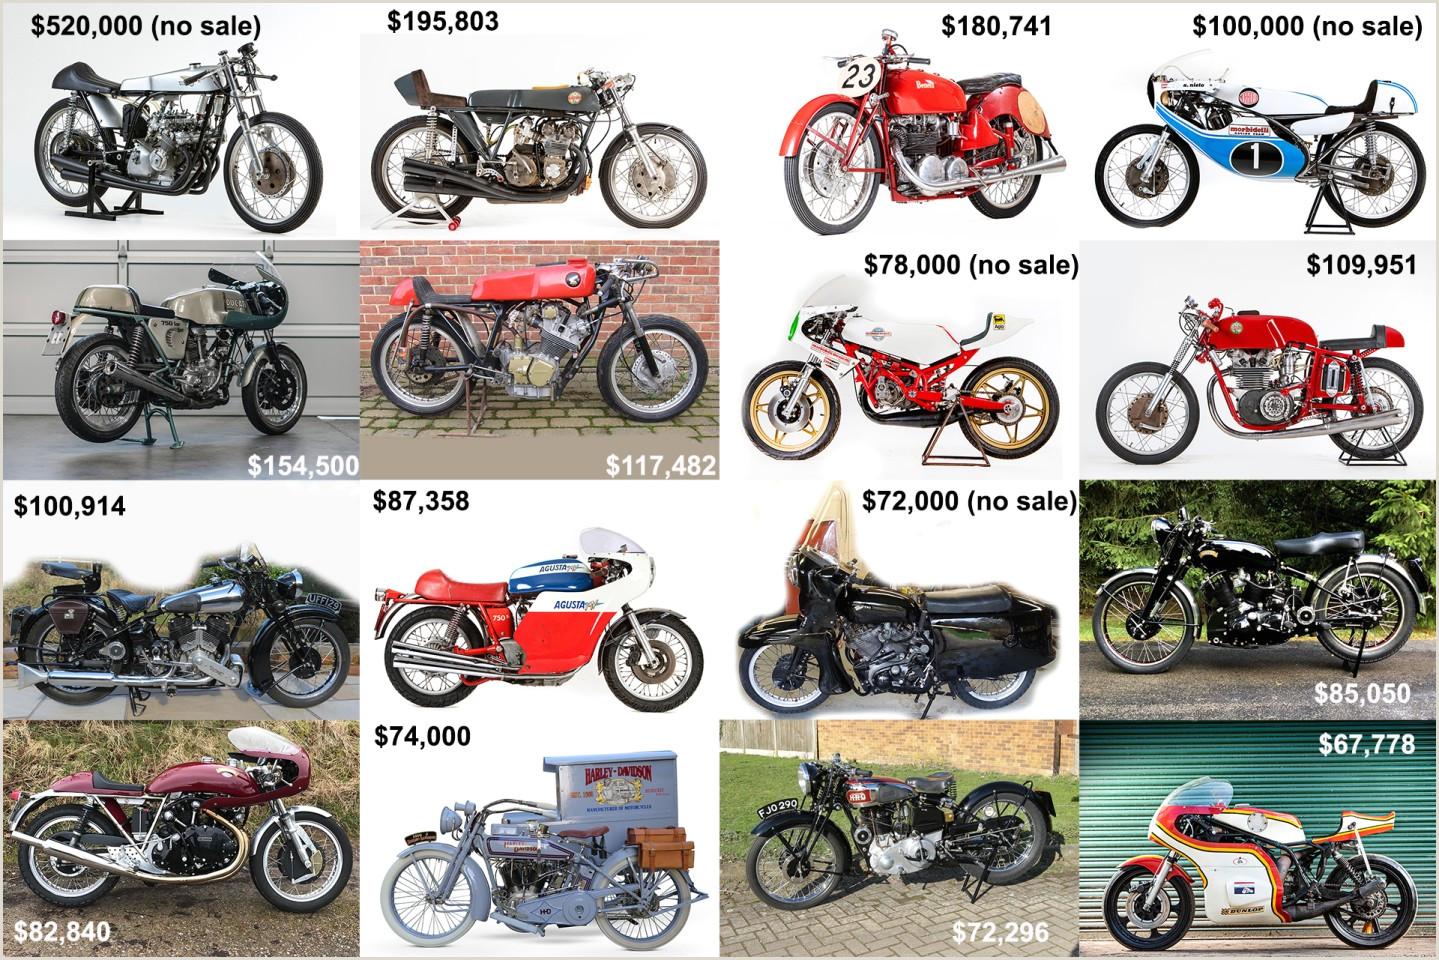 Unique Automotive Business Cards Massive Week In Vintage Motorcycle Auction Sales